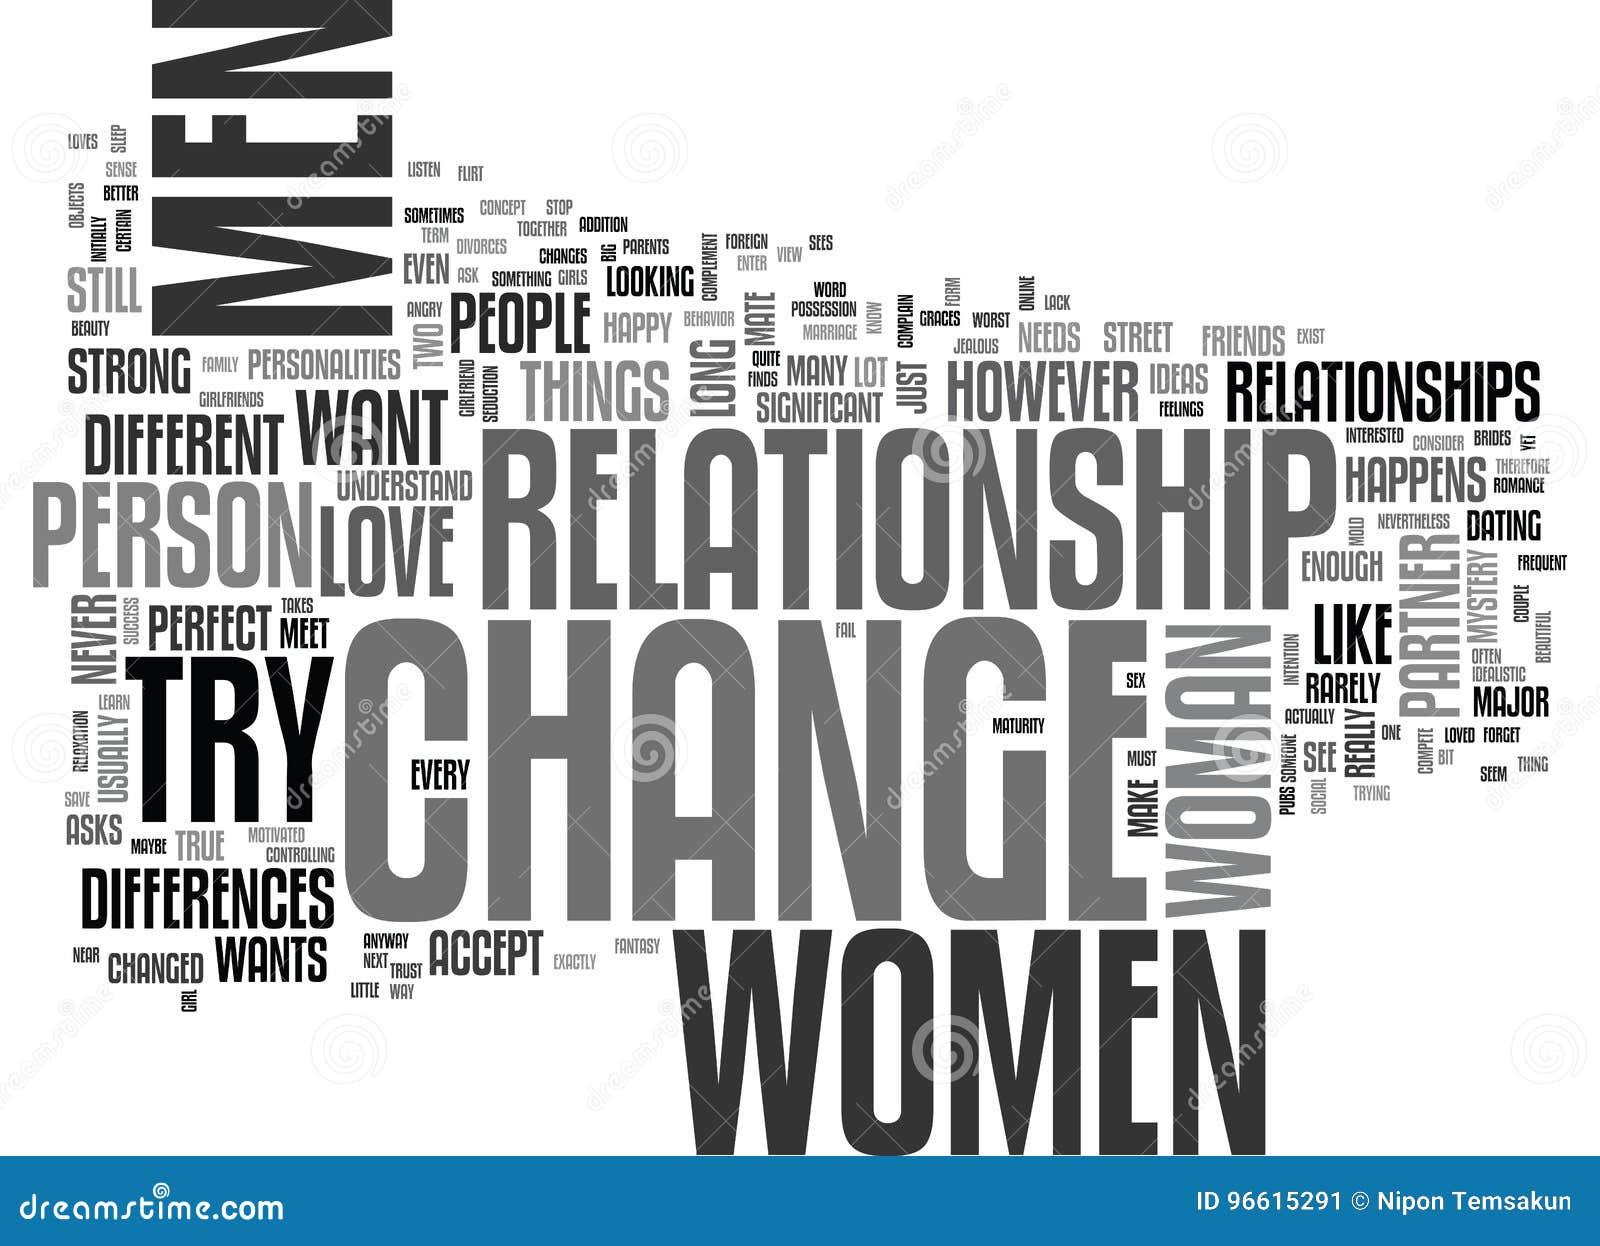 Why do women change